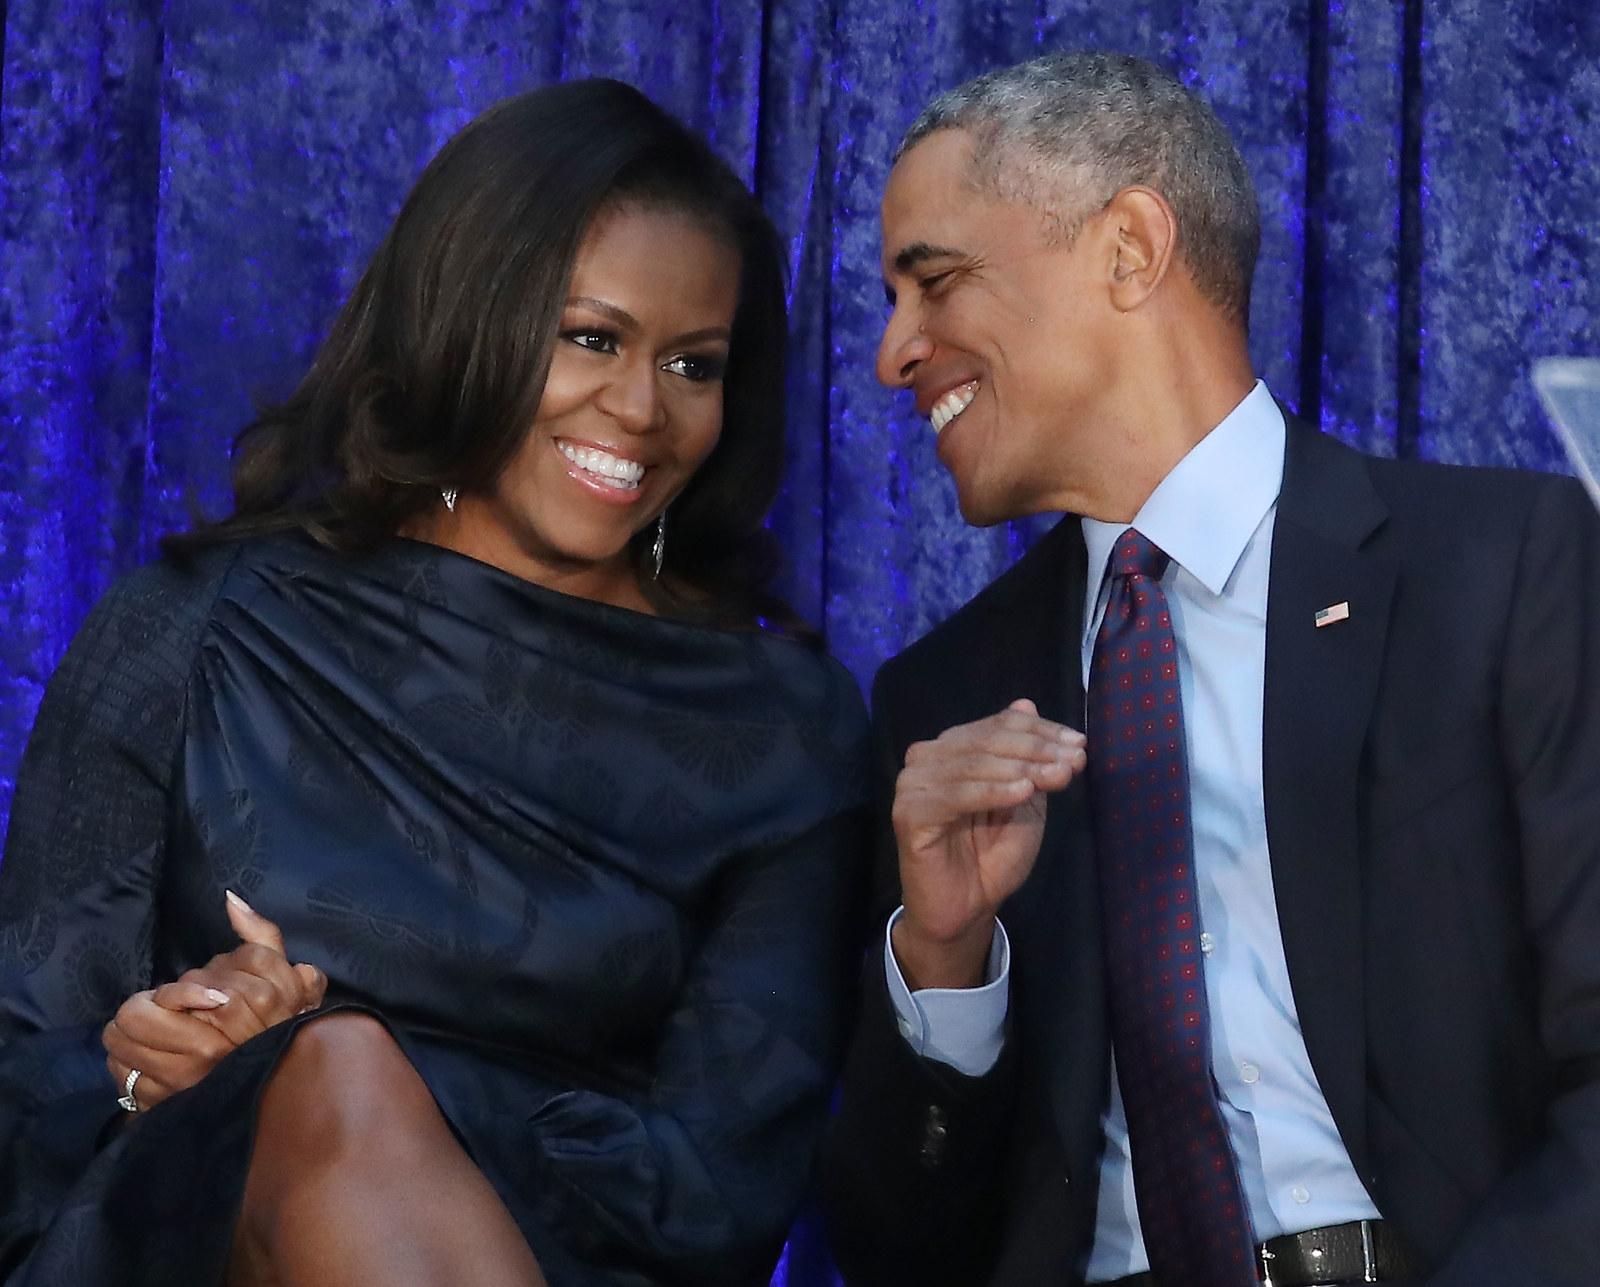 Funny dating profiles buzzfeed obama